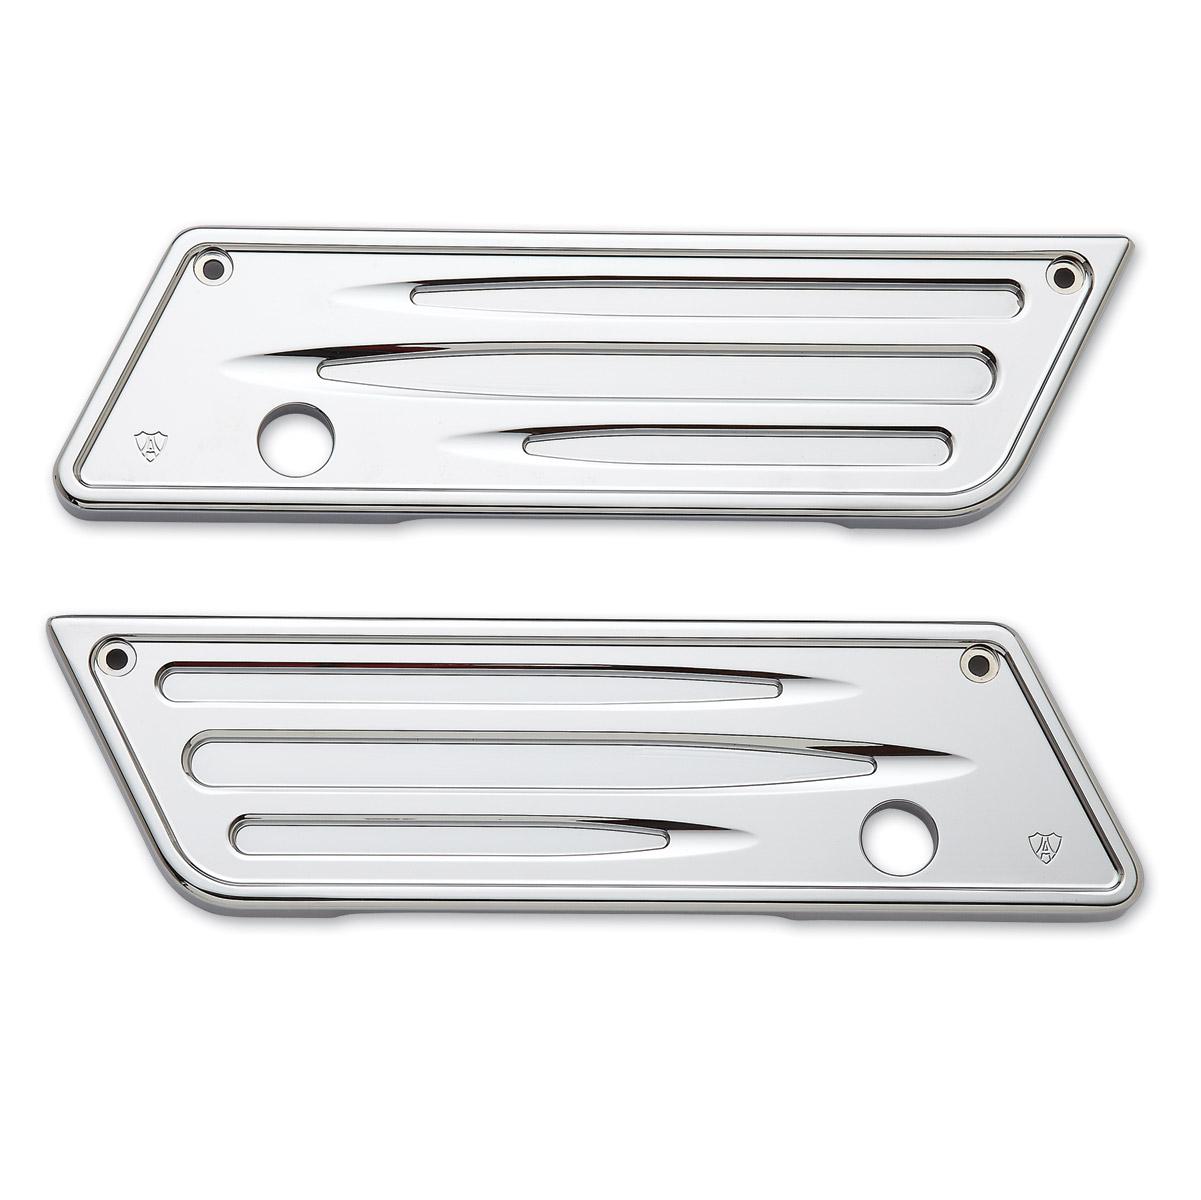 Arlen Ness Deep Cut Chrome Saddlebag Latch Covers